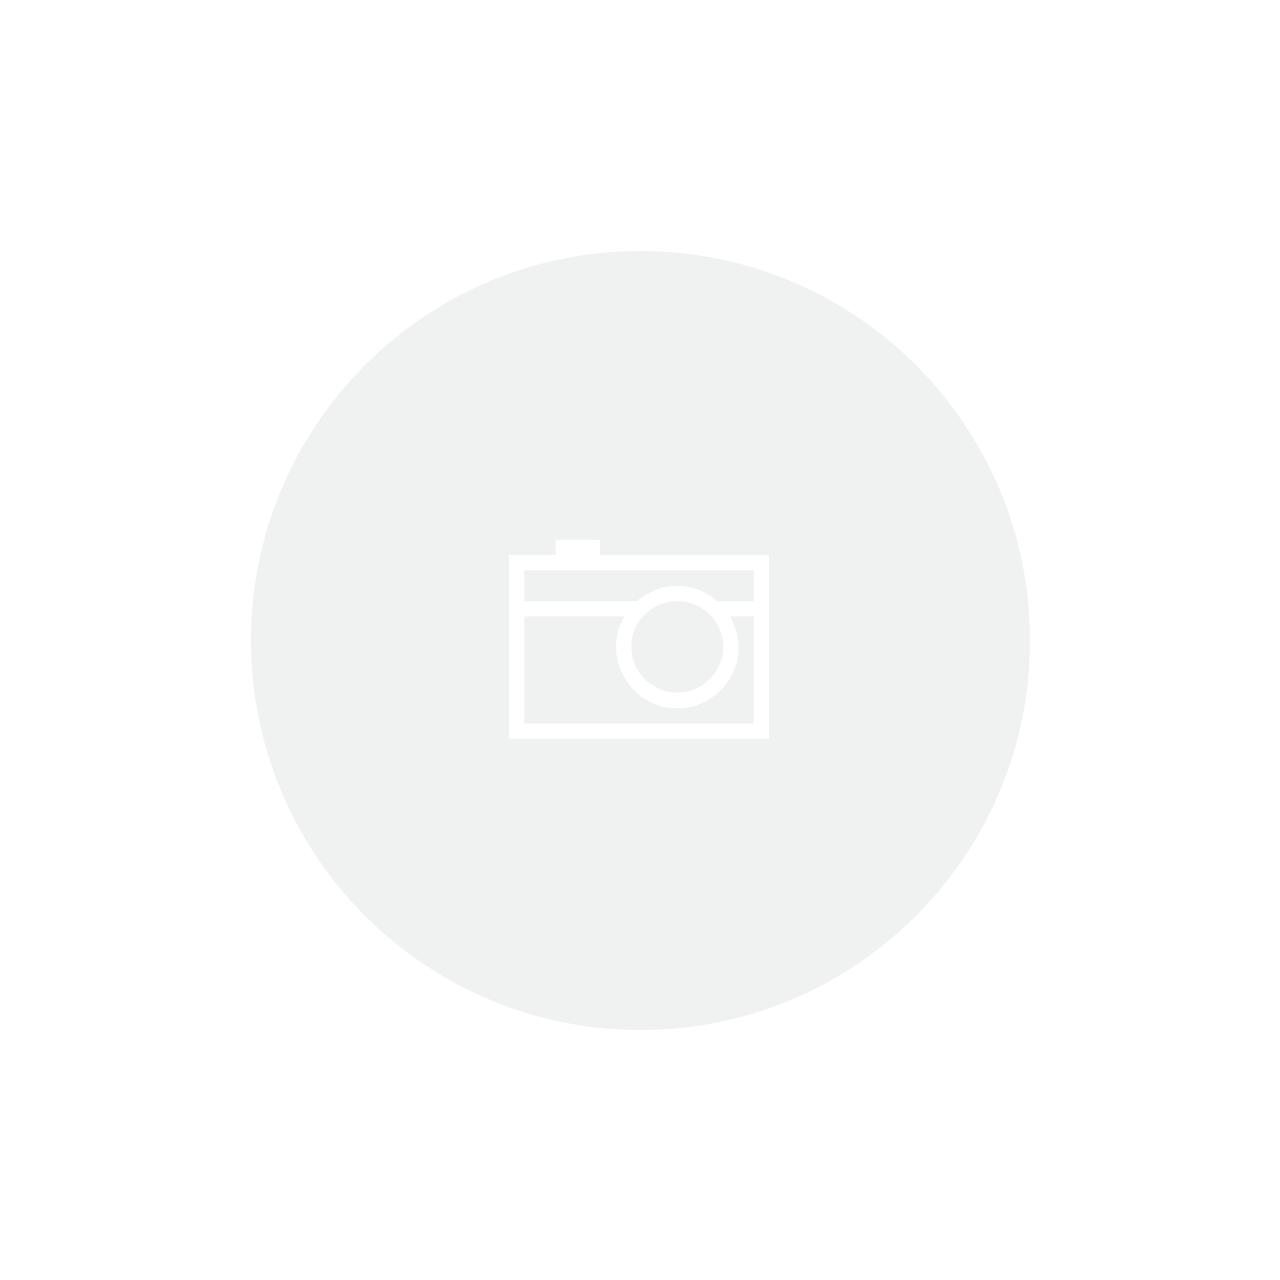 Escape Remus M3/M4 - Carbono